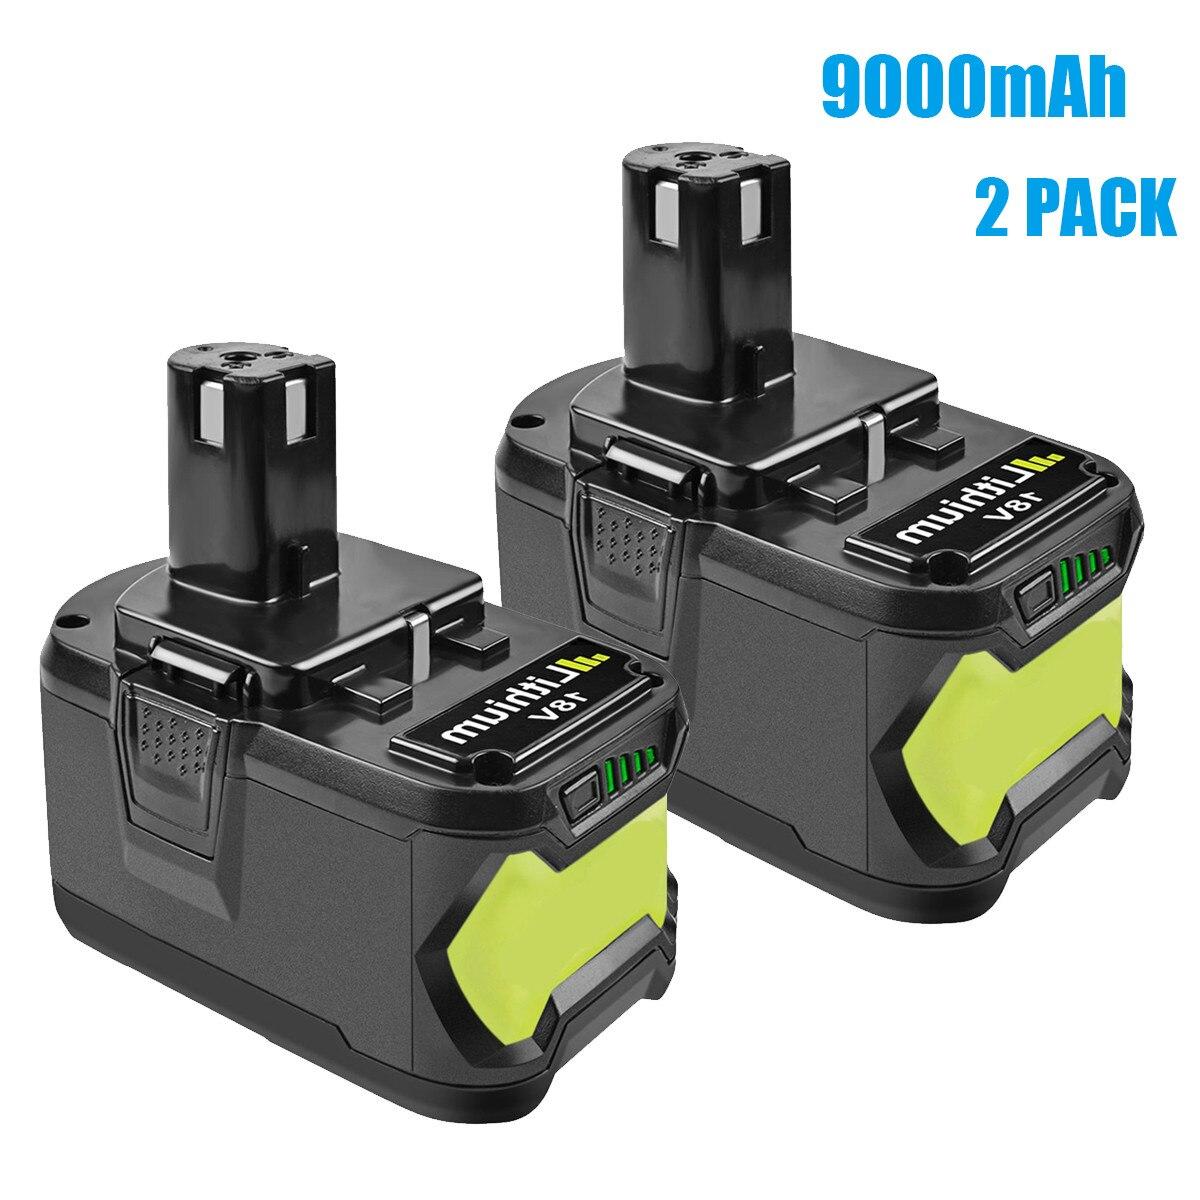 Bonadget For Ryobi 18V 6000mAh 9000mAh P108 Battery RB18 Lithium Ion Rechargeable Battery Pack Power Tools Battery Ryobi ONE+